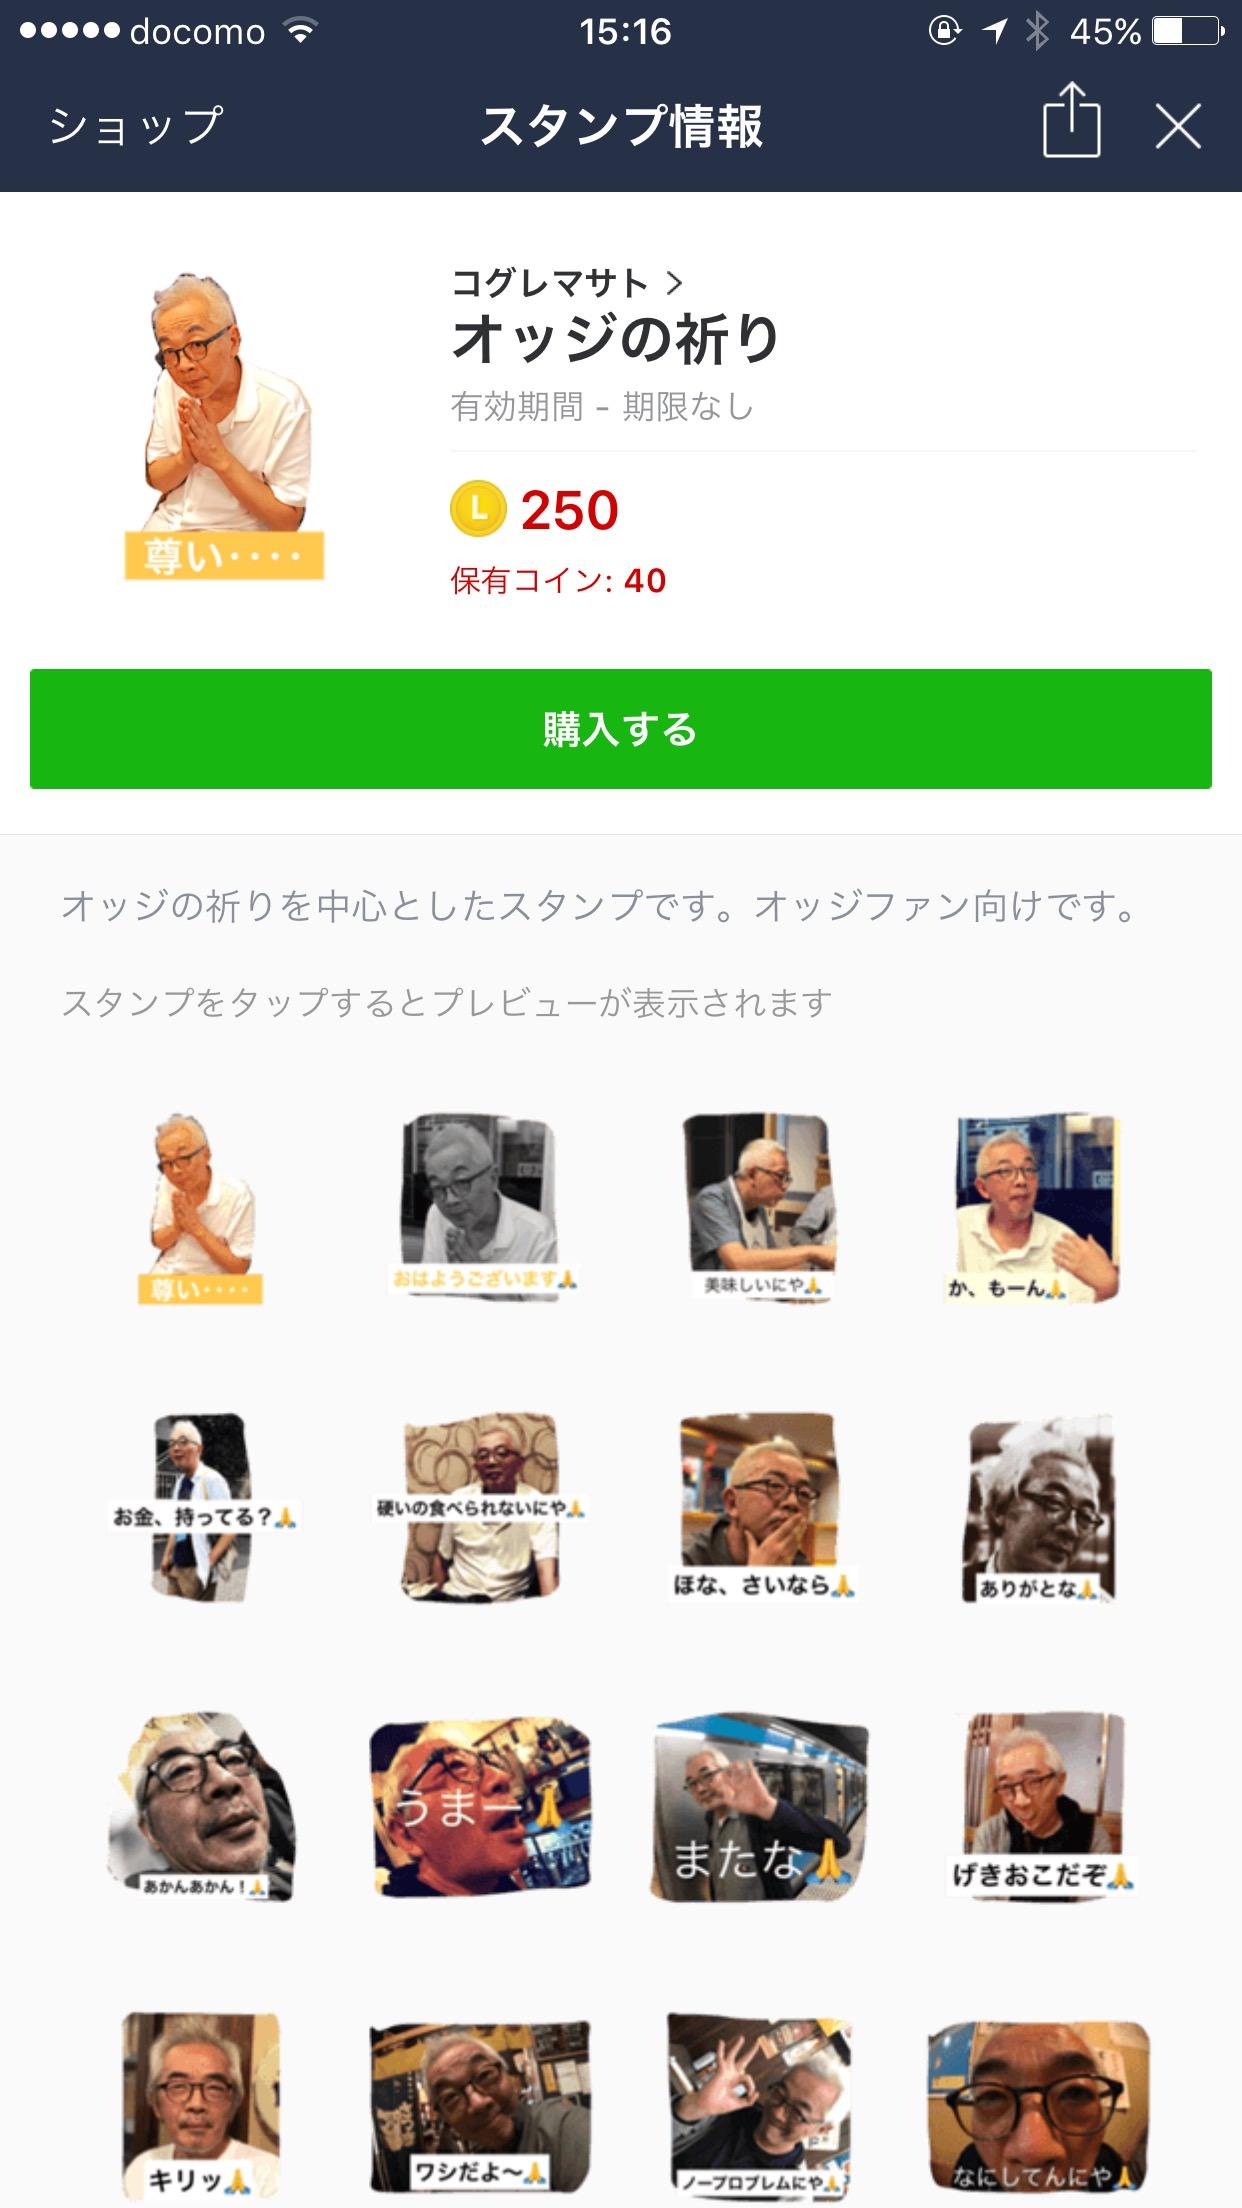 Line creators stamp 5594